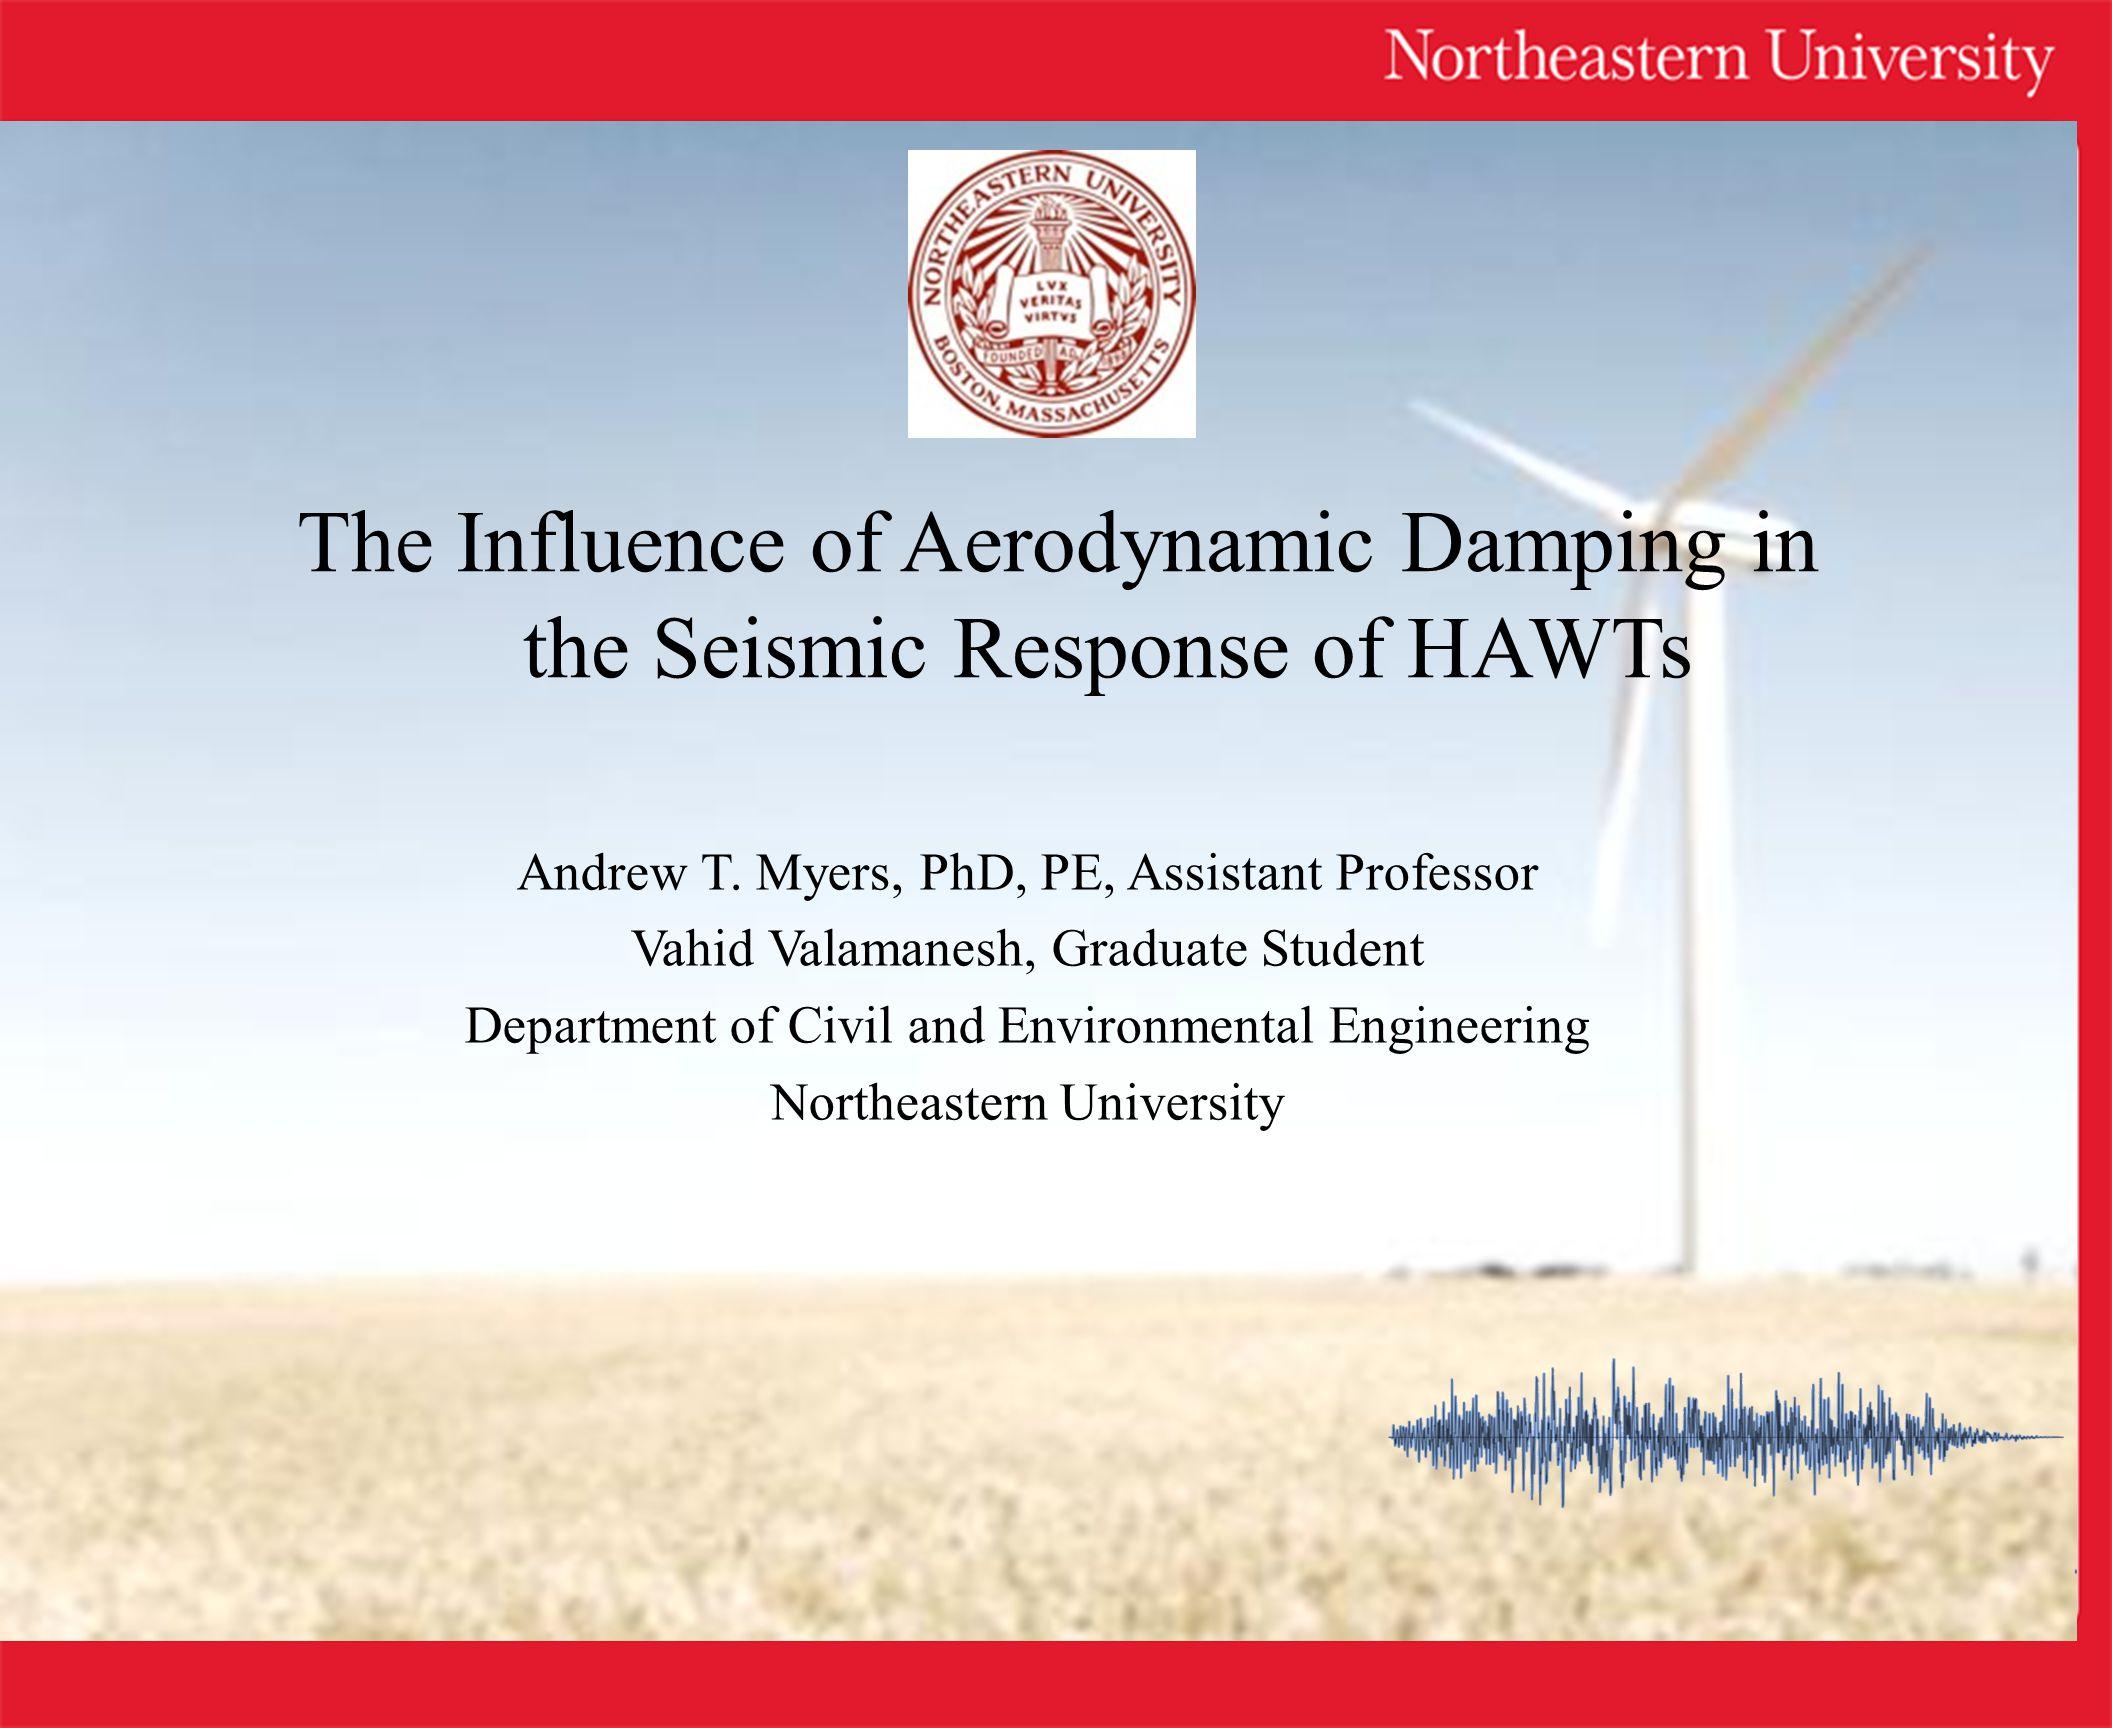 Andrew T. Myers, PhD, PE, Assistant Professor Vahid Valamanesh, Graduate Student Department of Civil and Environmental Engineering Northeastern Univer